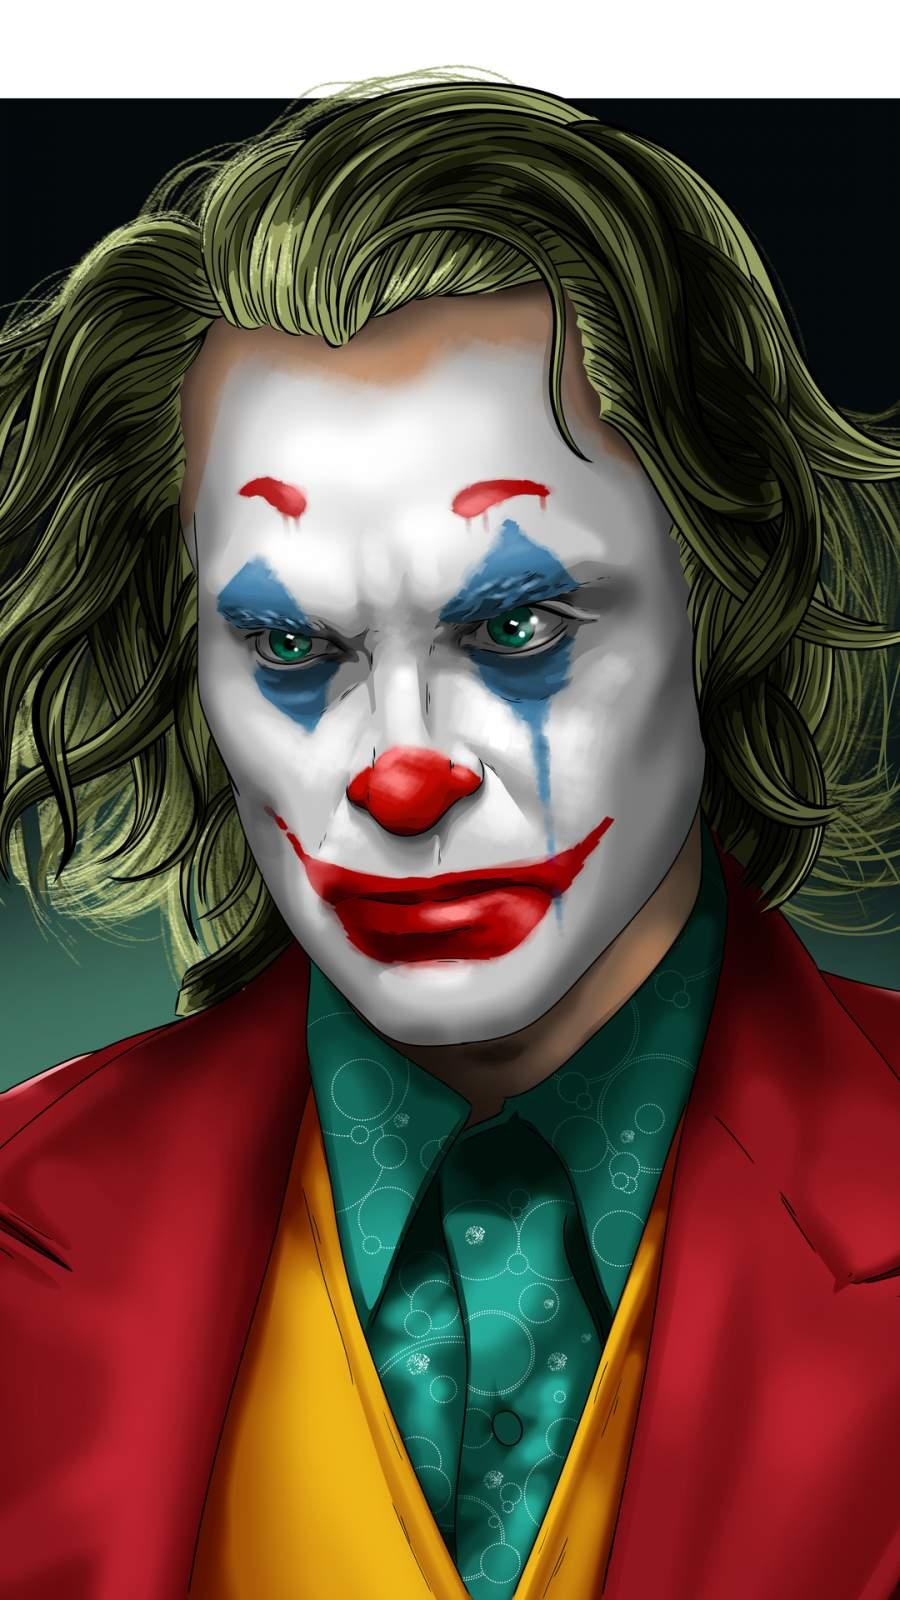 Joker Artwork New iPhone Wallpaper